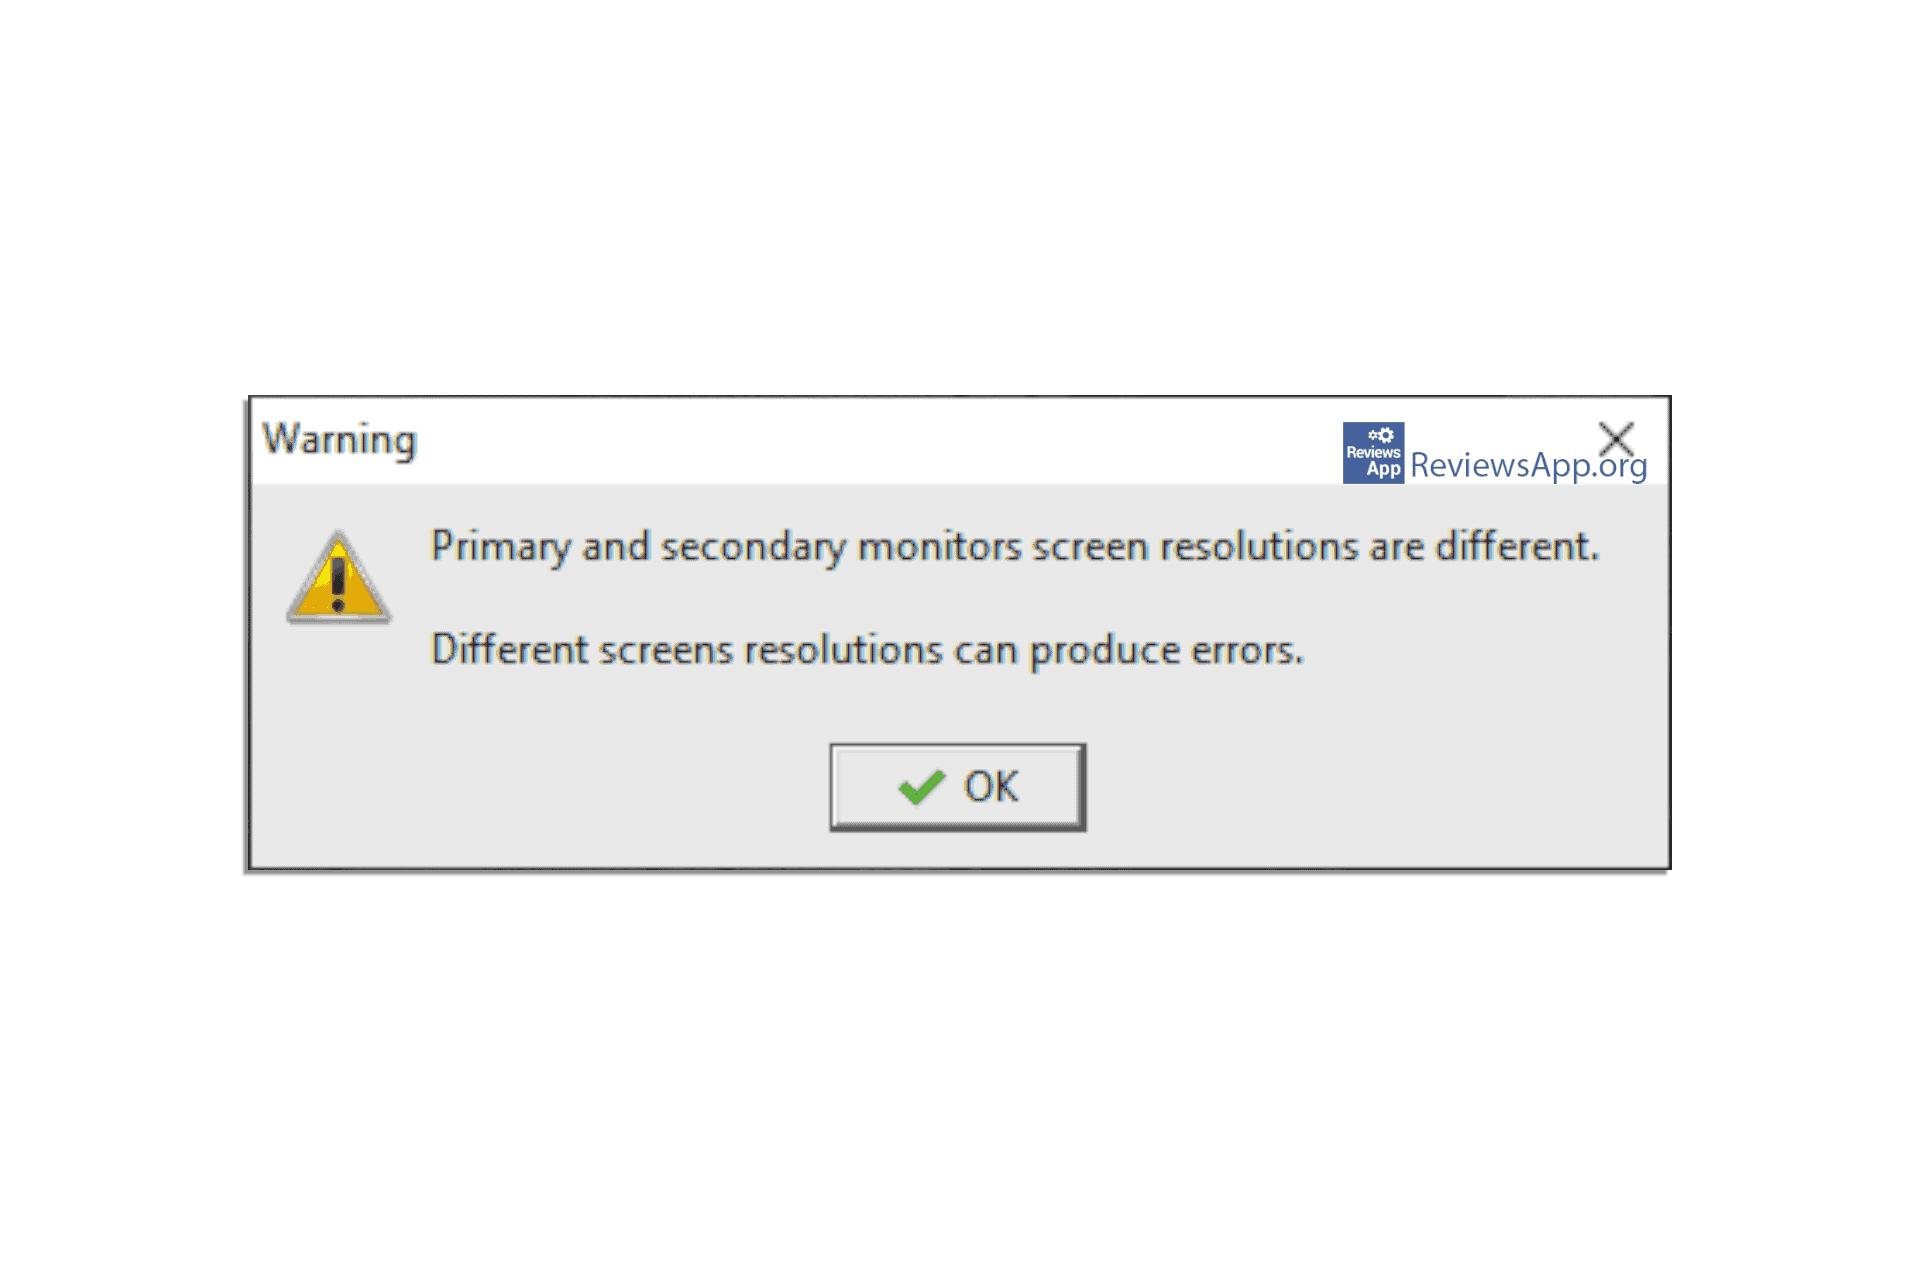 ScreenGridy error